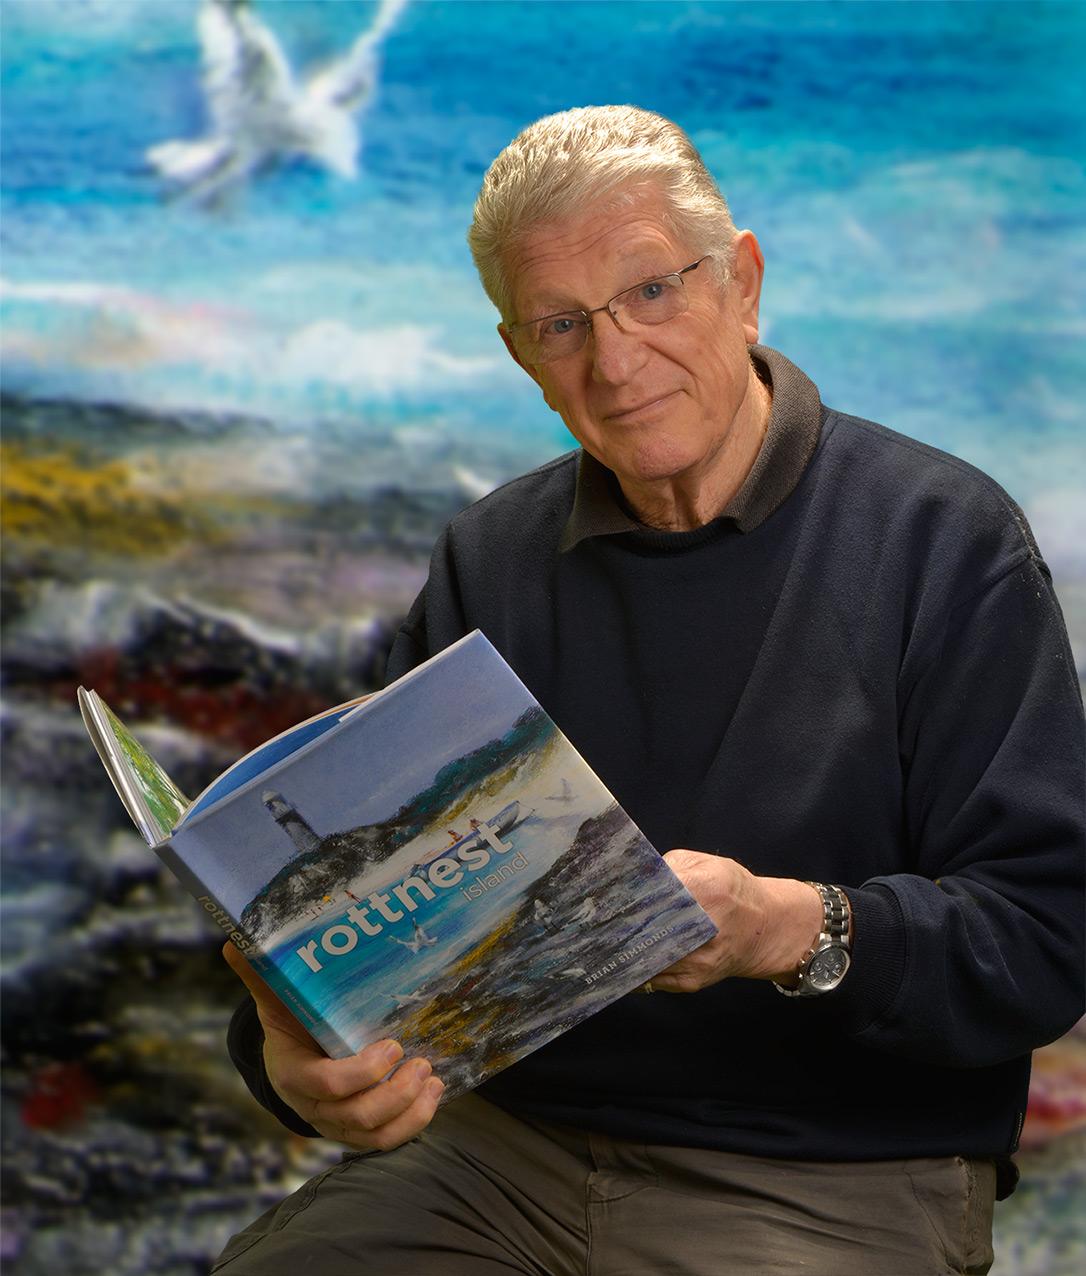 Western Australian artist Brian Simmonds